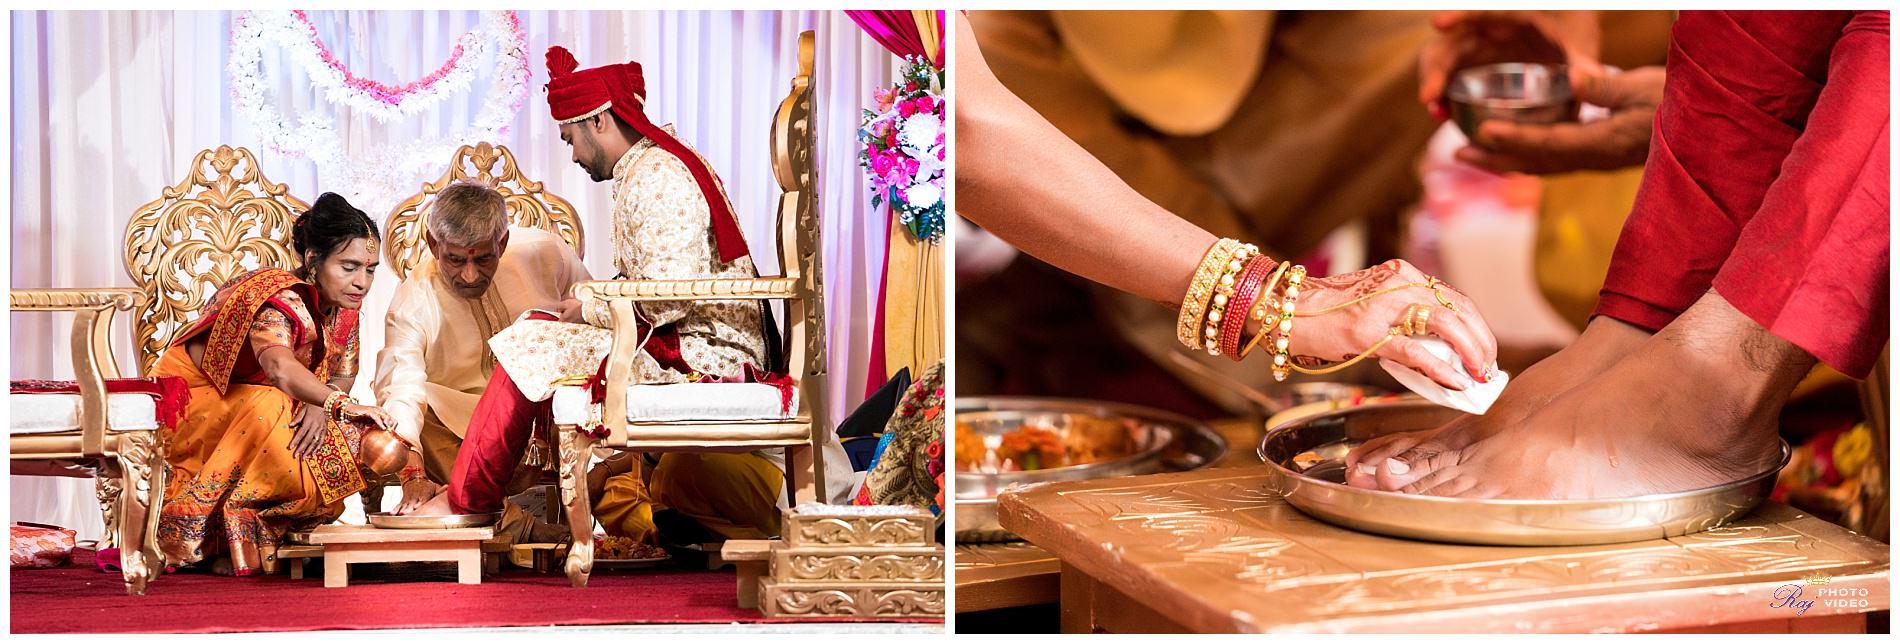 doubletree-by-hilton-hotel-wilmington-de-wedding-krishna-ritesh-51.jpg